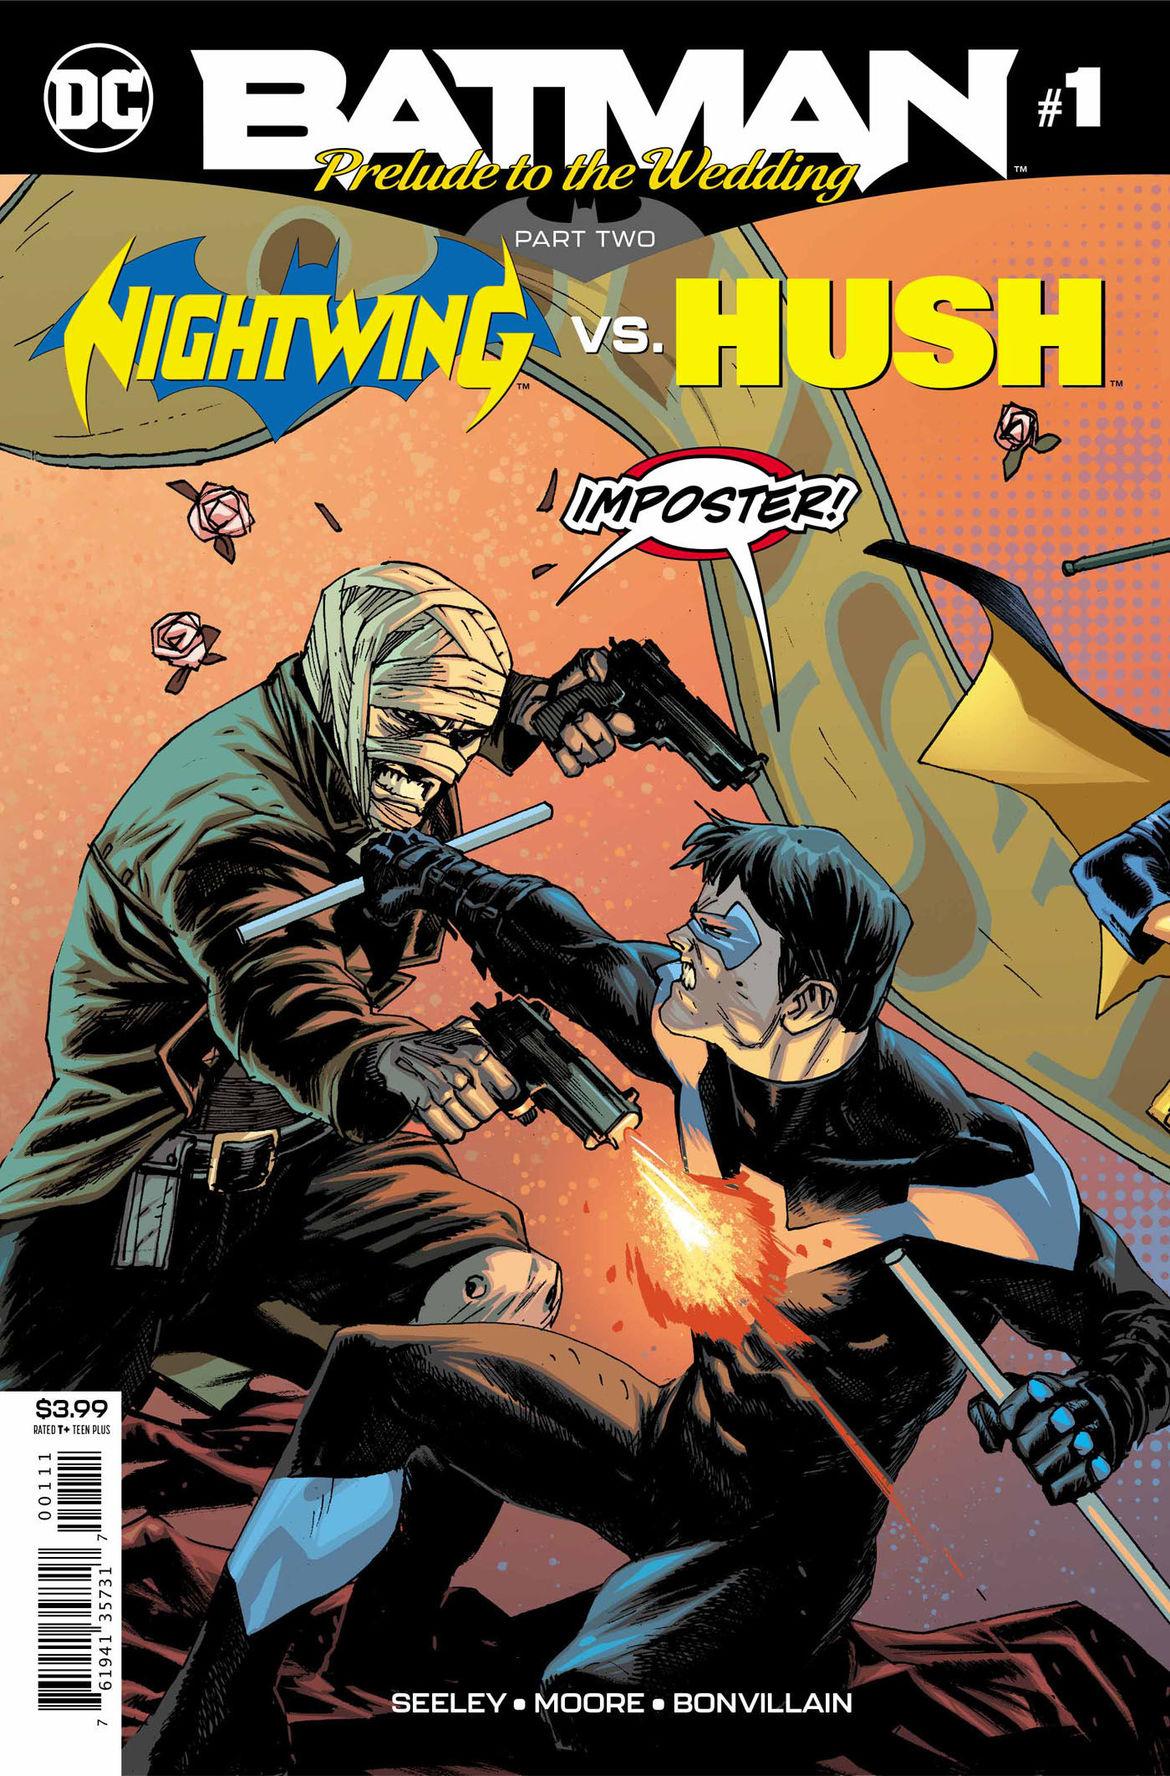 Batman Prelude to the Wedding Nightwing vs Hush 1 cover